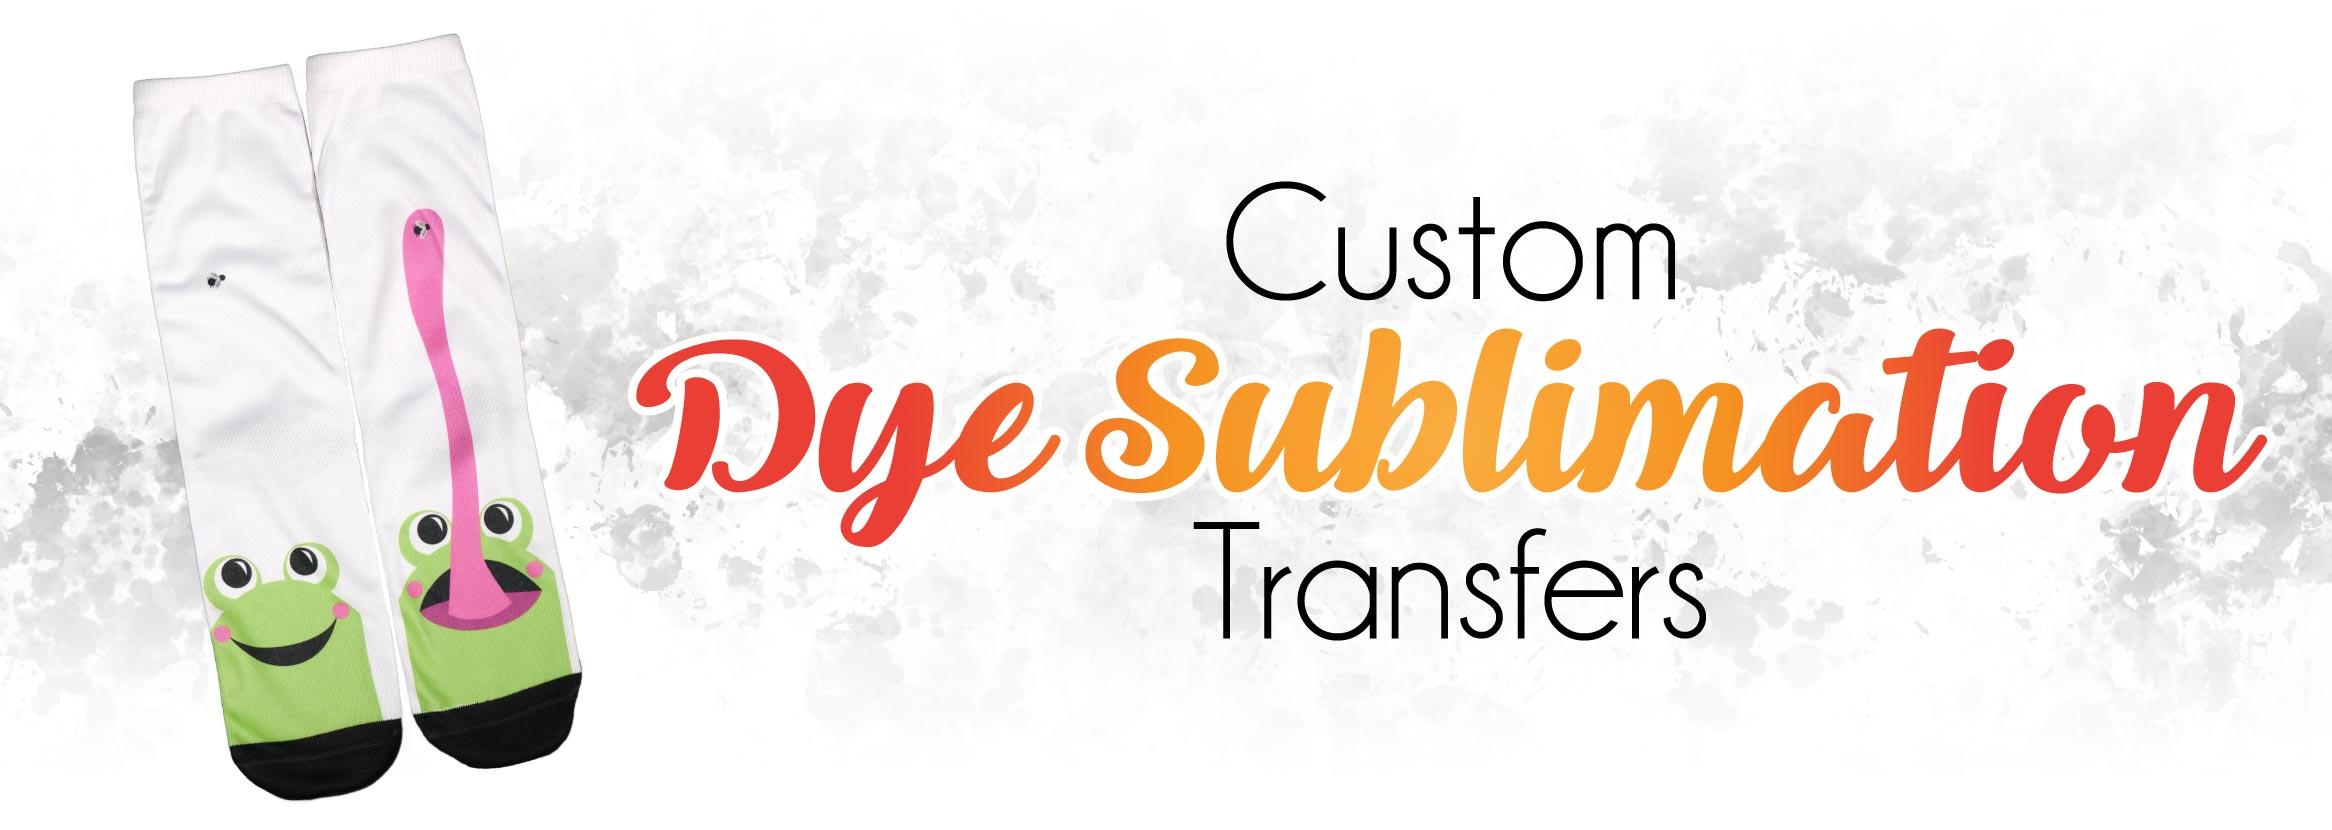 Custom Dye Sublimation Transfer